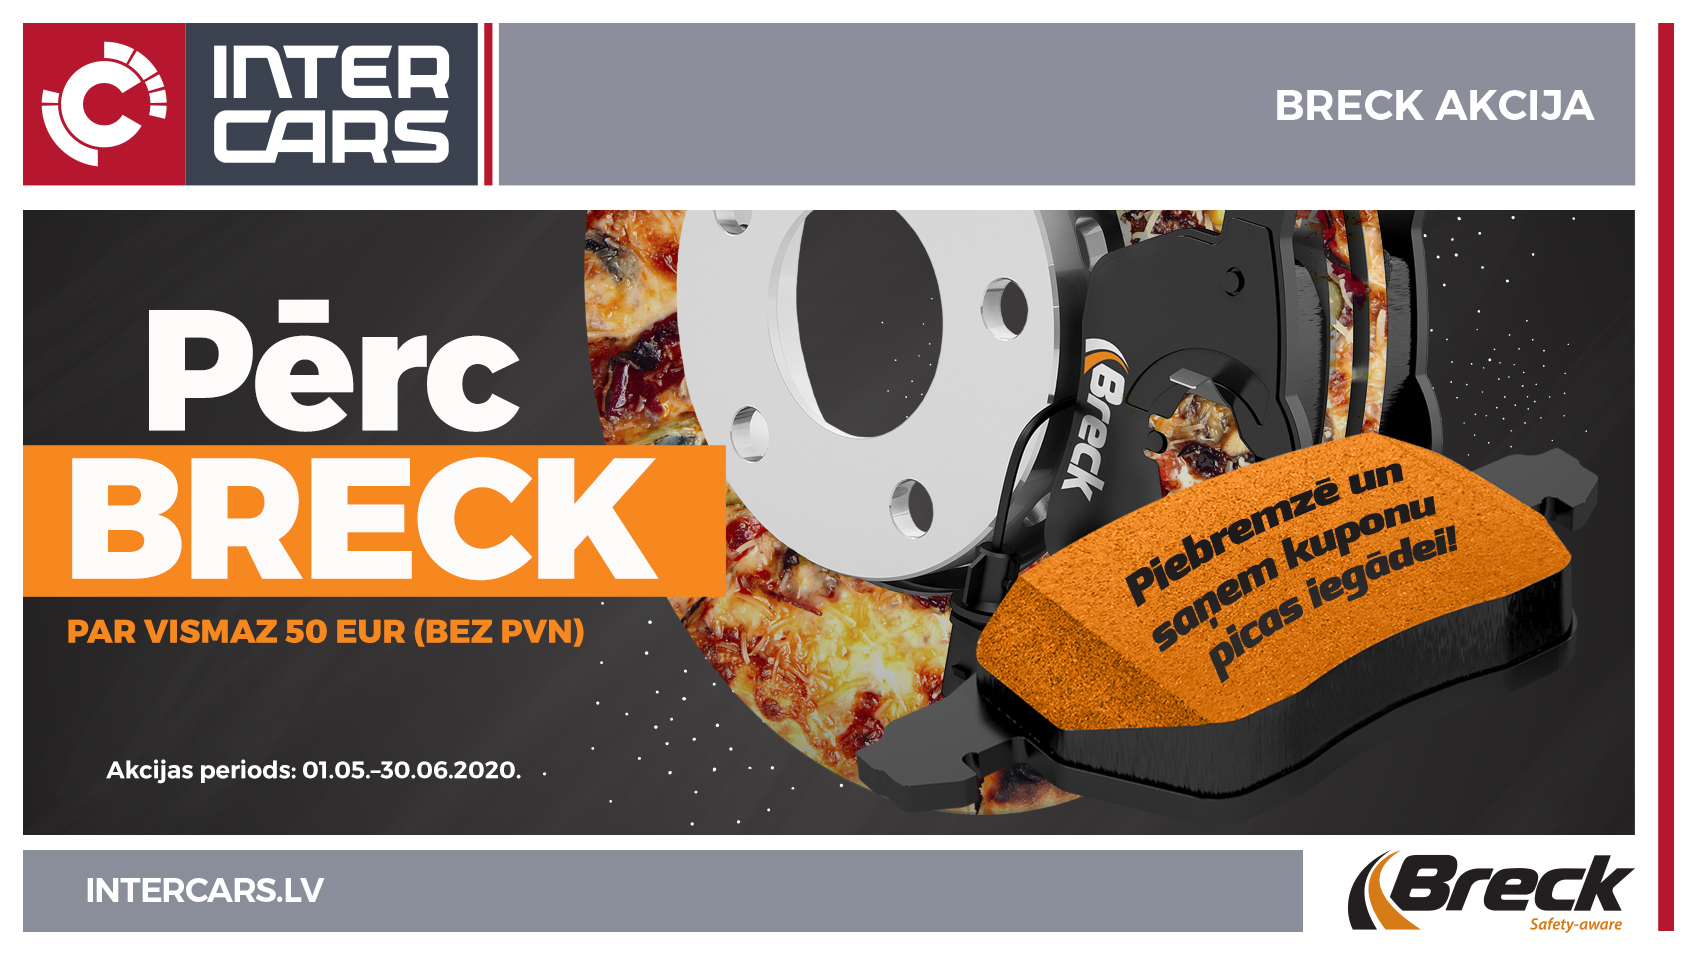 breck-akcija-mai2020screen.jpg